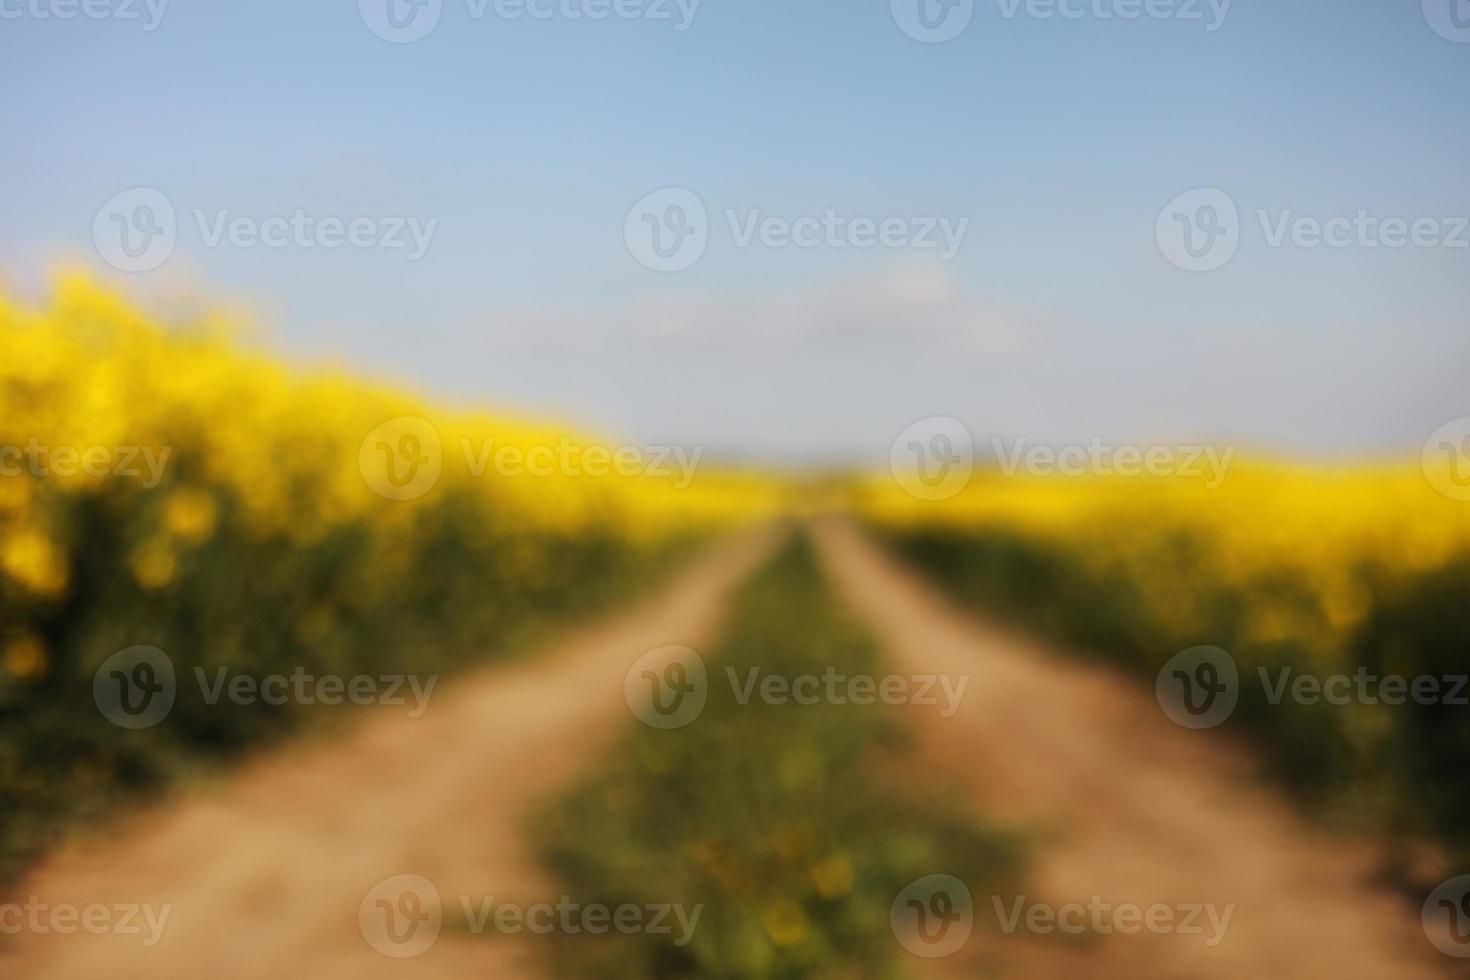 suddig bakgrund av gult raps på en bakgrund av himlen. selektivt fokus på färg. rapsfält med mogen raps, jordbruksbakgrund foto